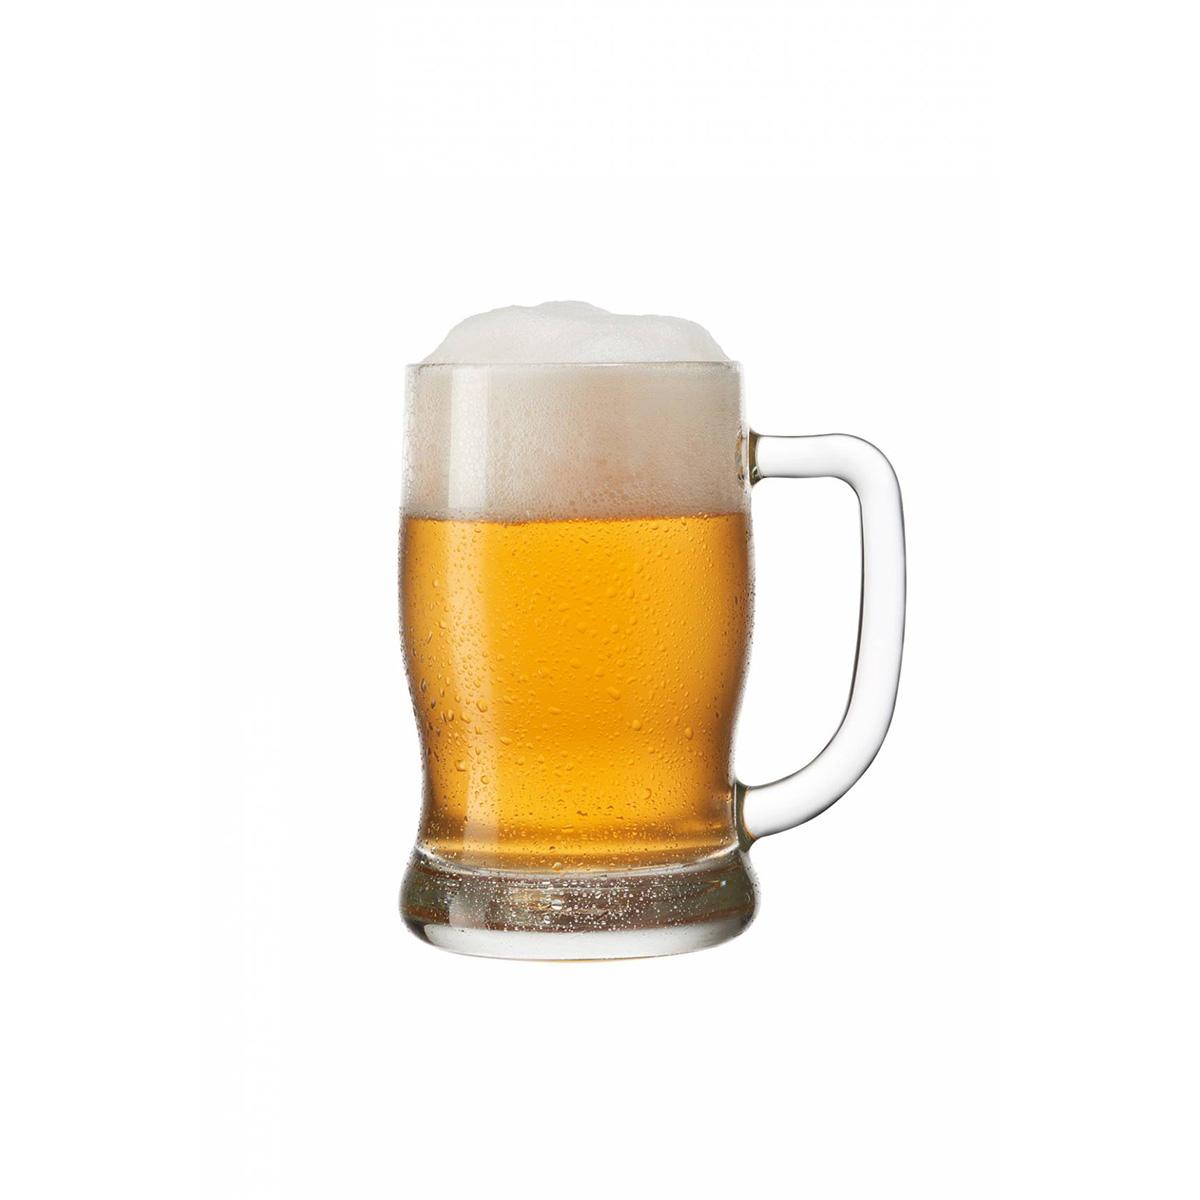 Krigla za pivo set 1/2 49457